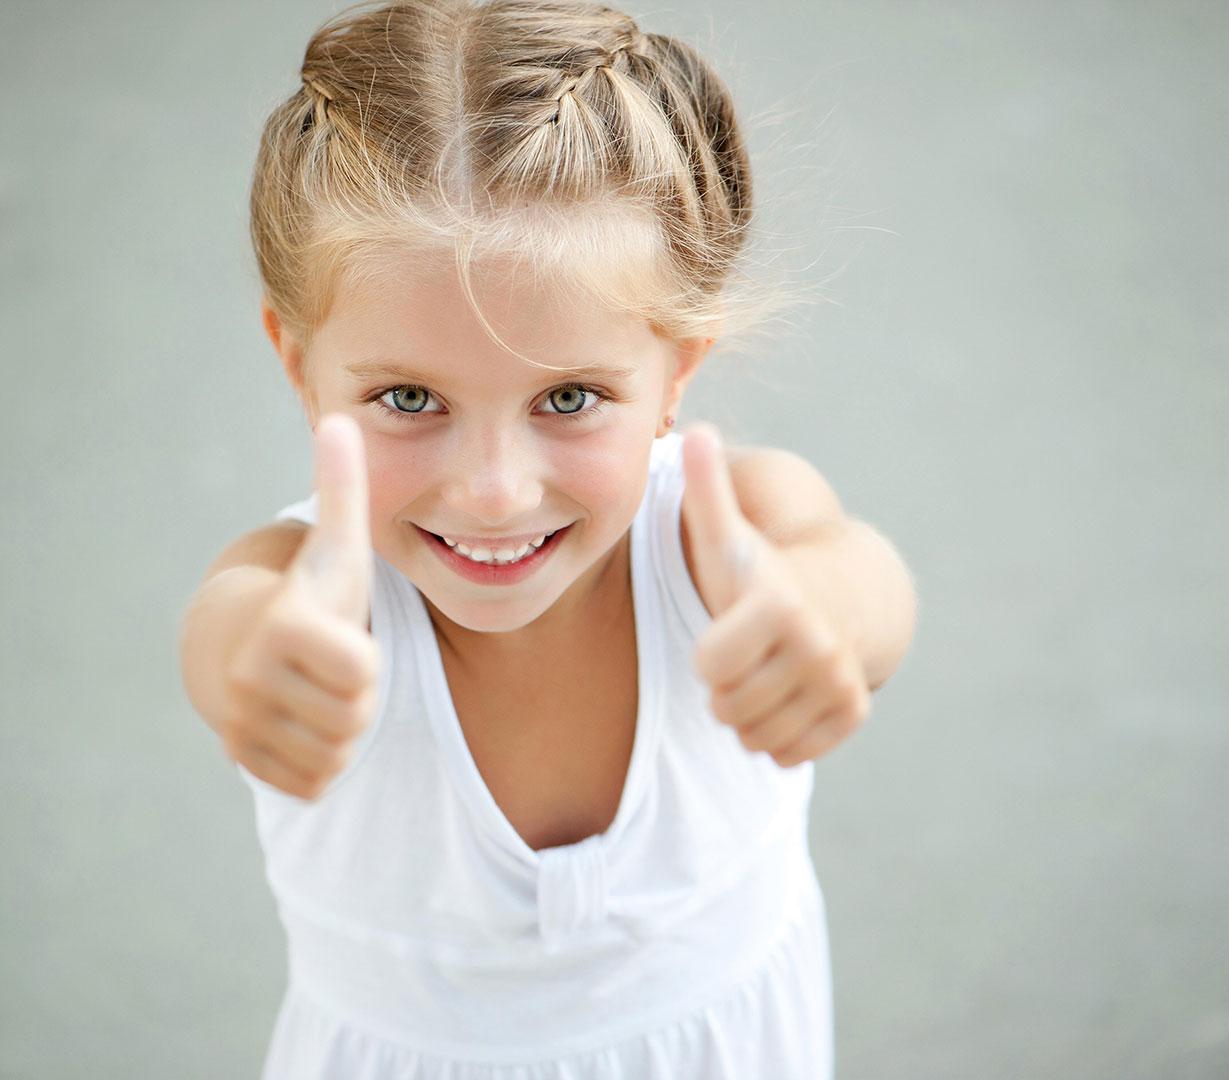 Effective Advertising Girl Thumbs Up